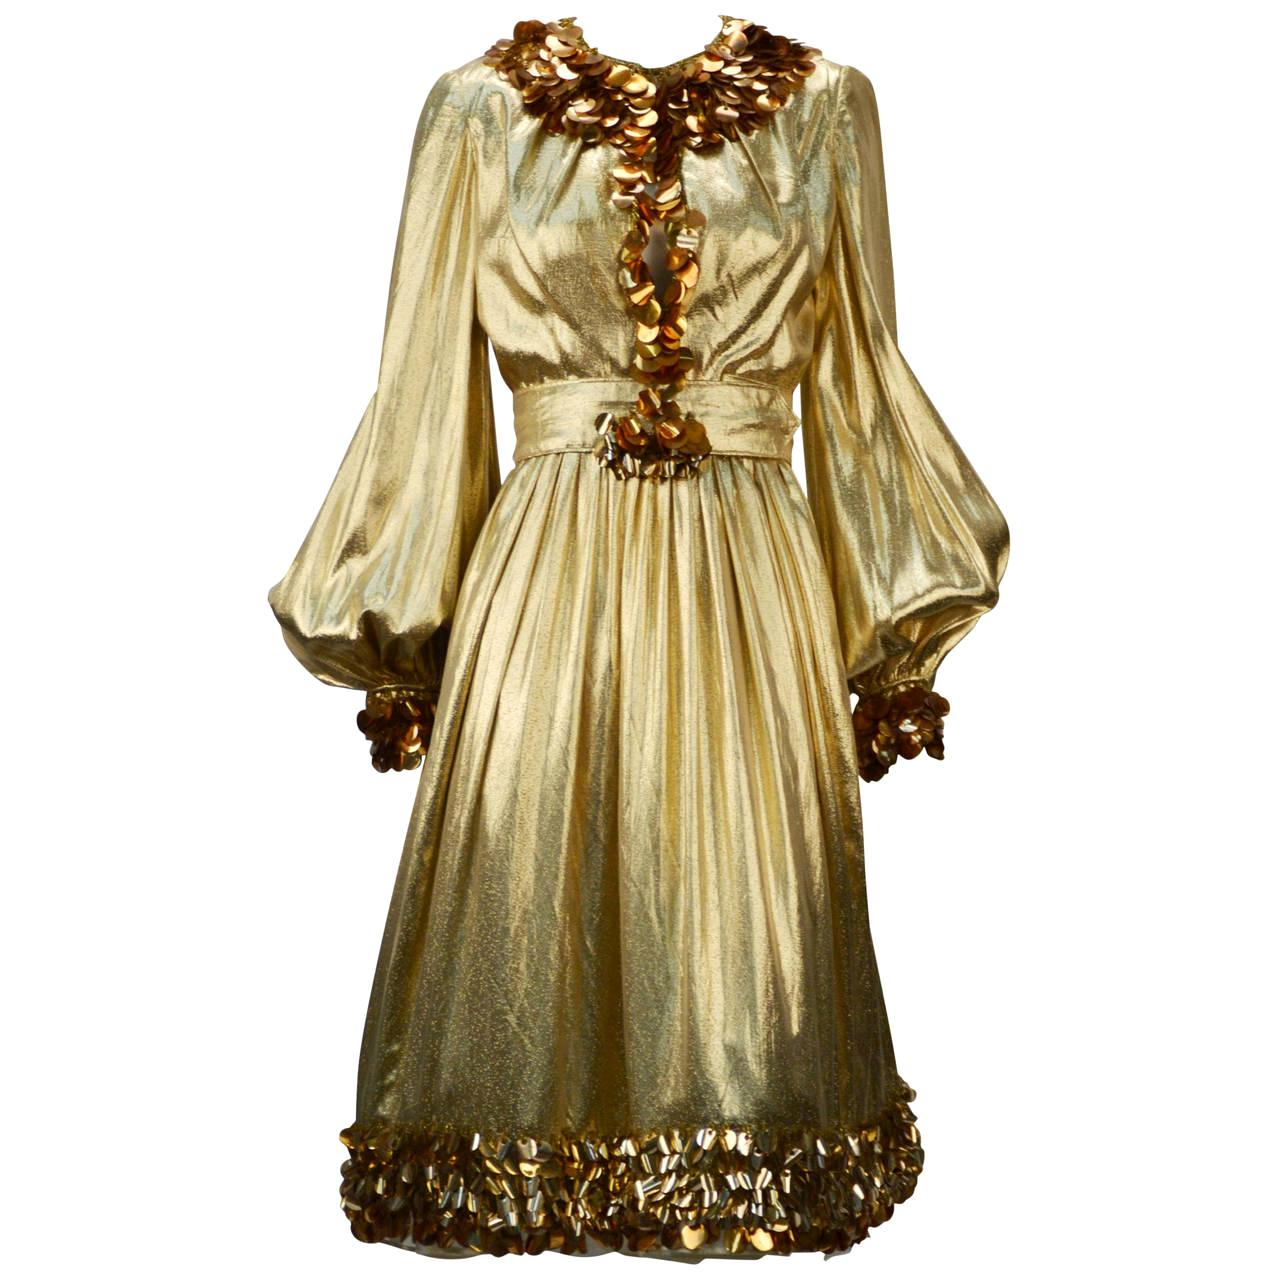 1960s Donald Brooks Gold Metallic Evening Dress with Sequin and Beaded Trim